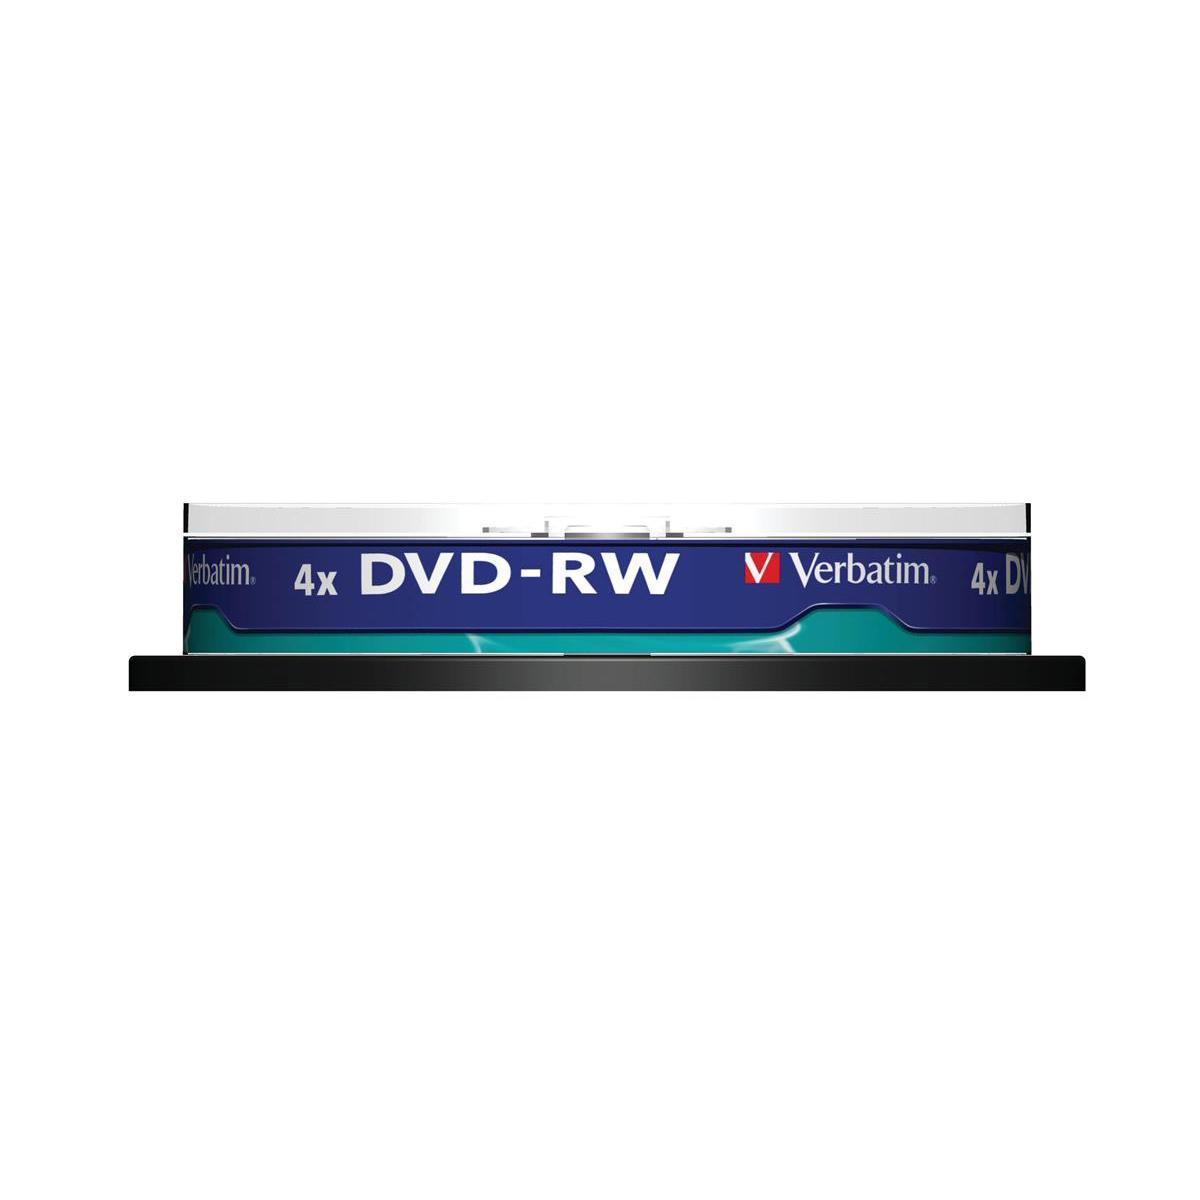 Verbatim DVD-RW Recordable Ref 43552 [Pack 10]